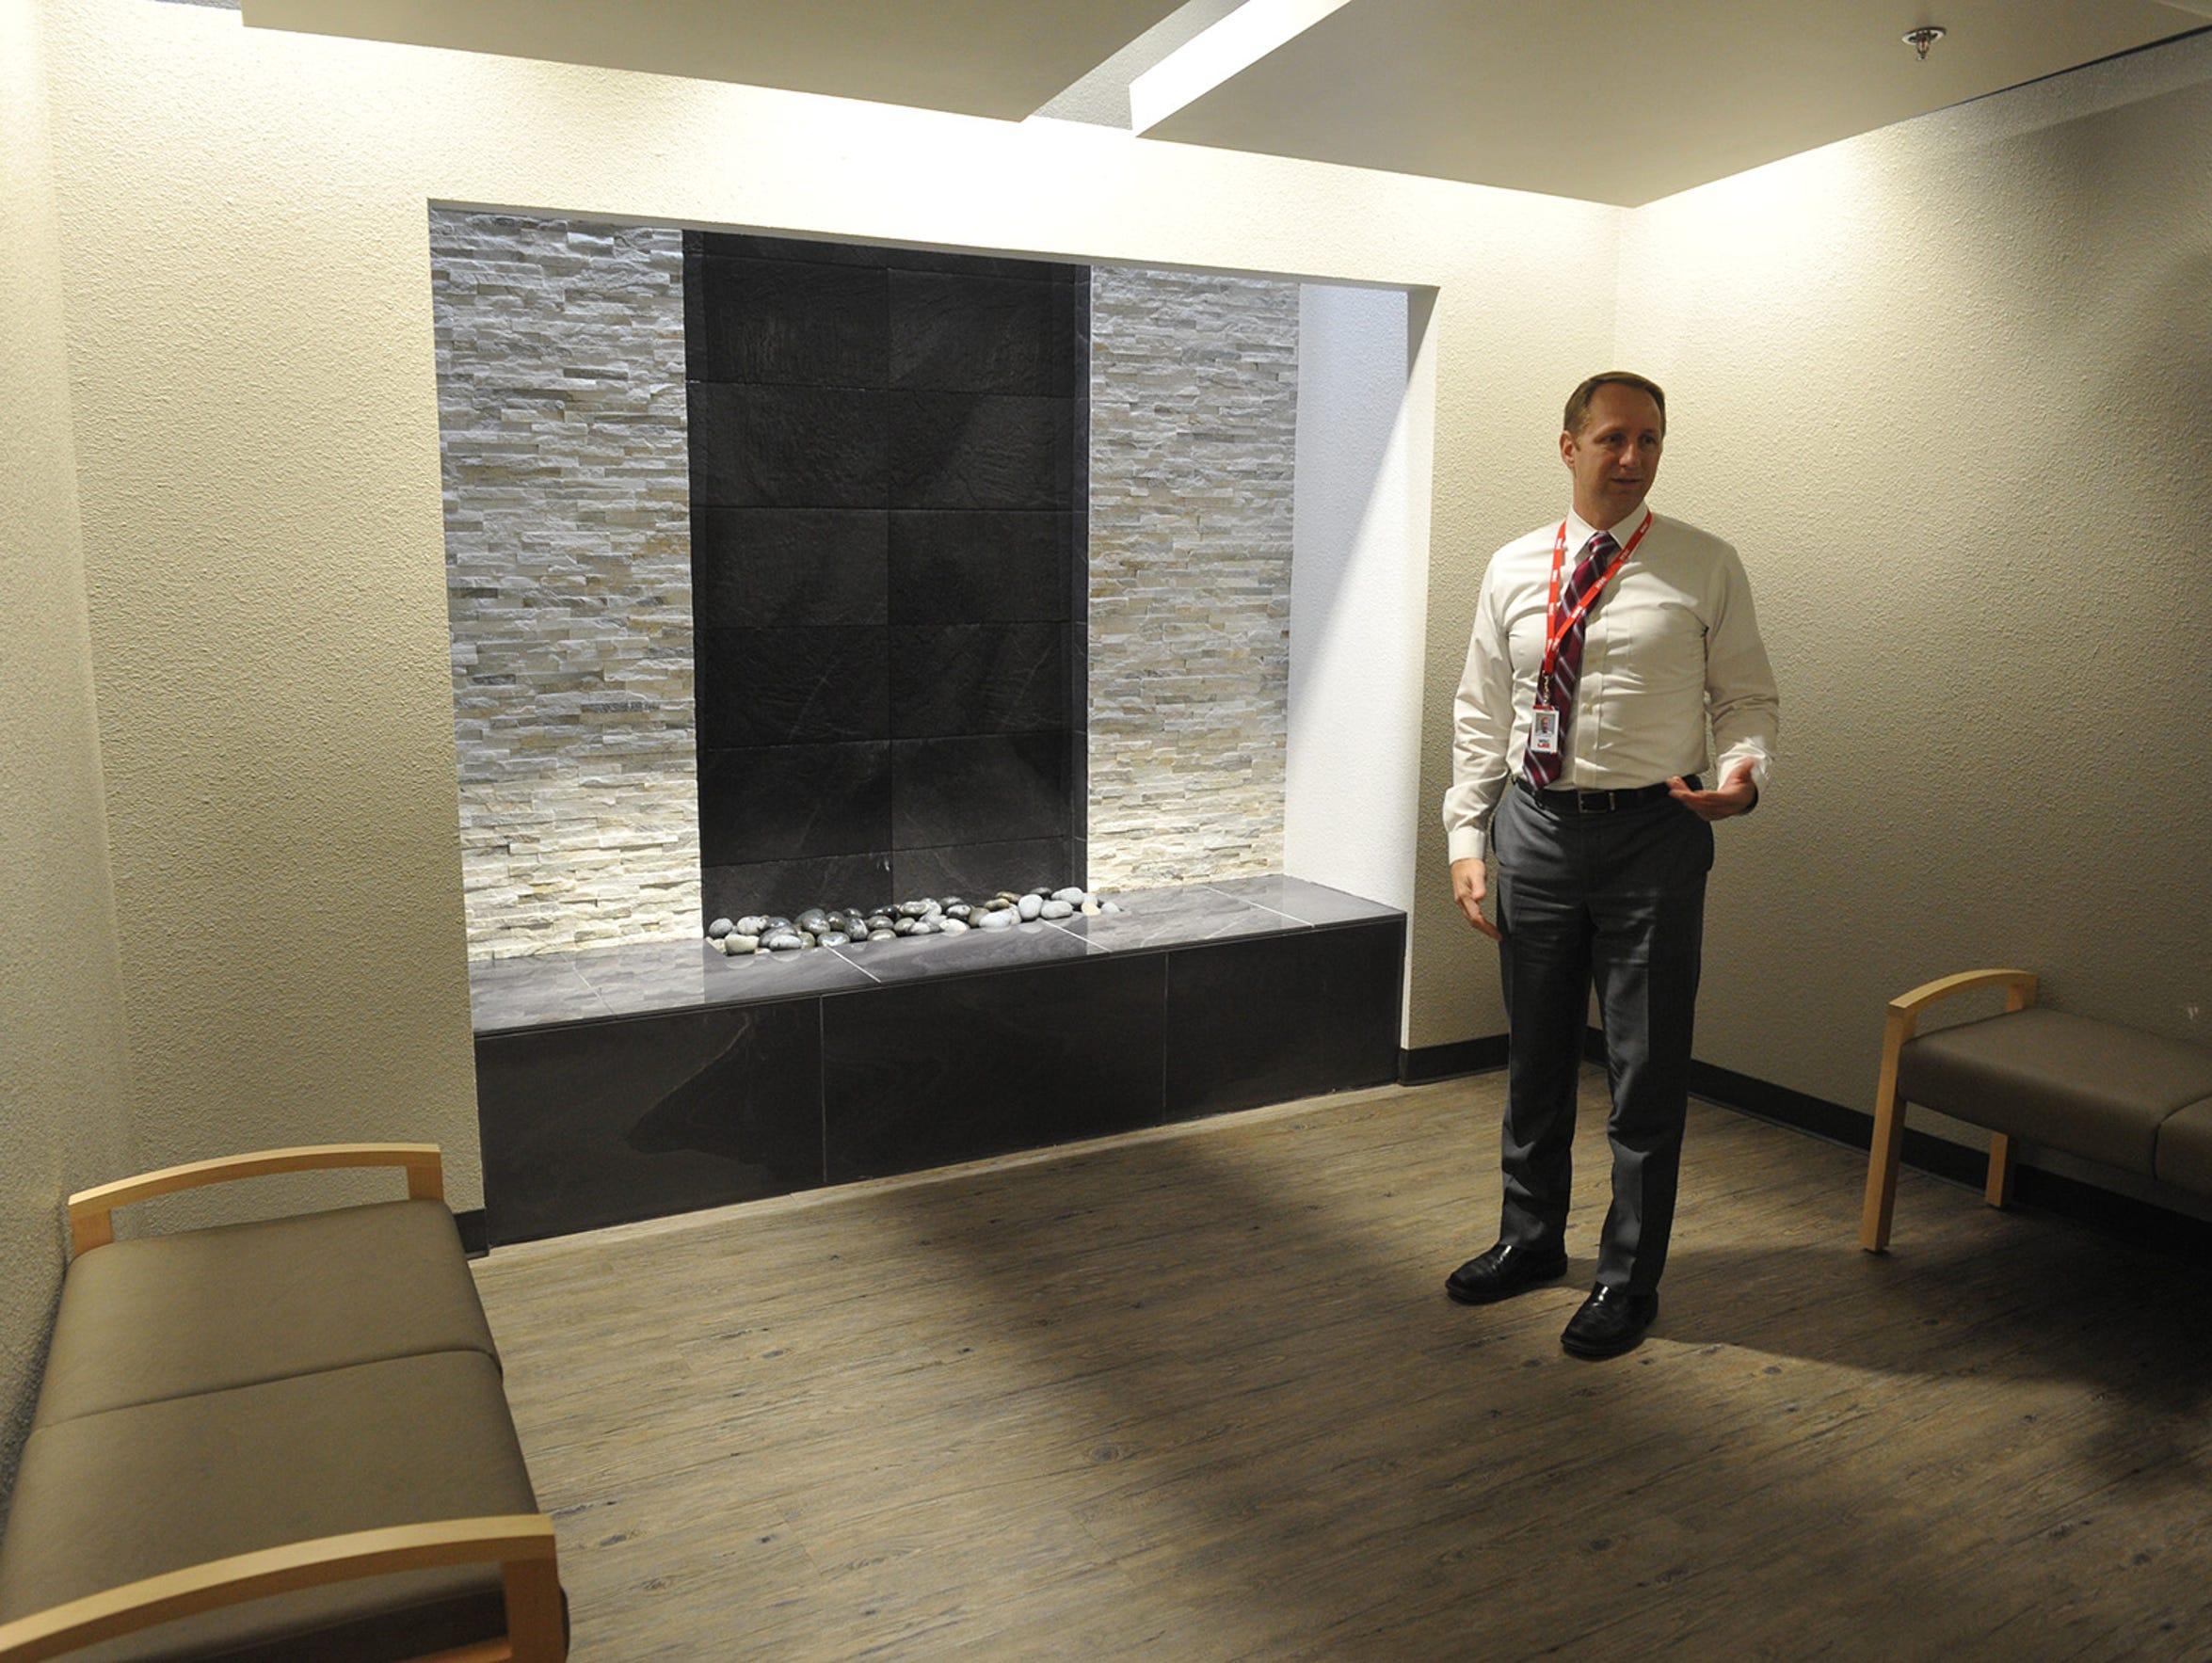 Work Services Corporation president David Toogood describes